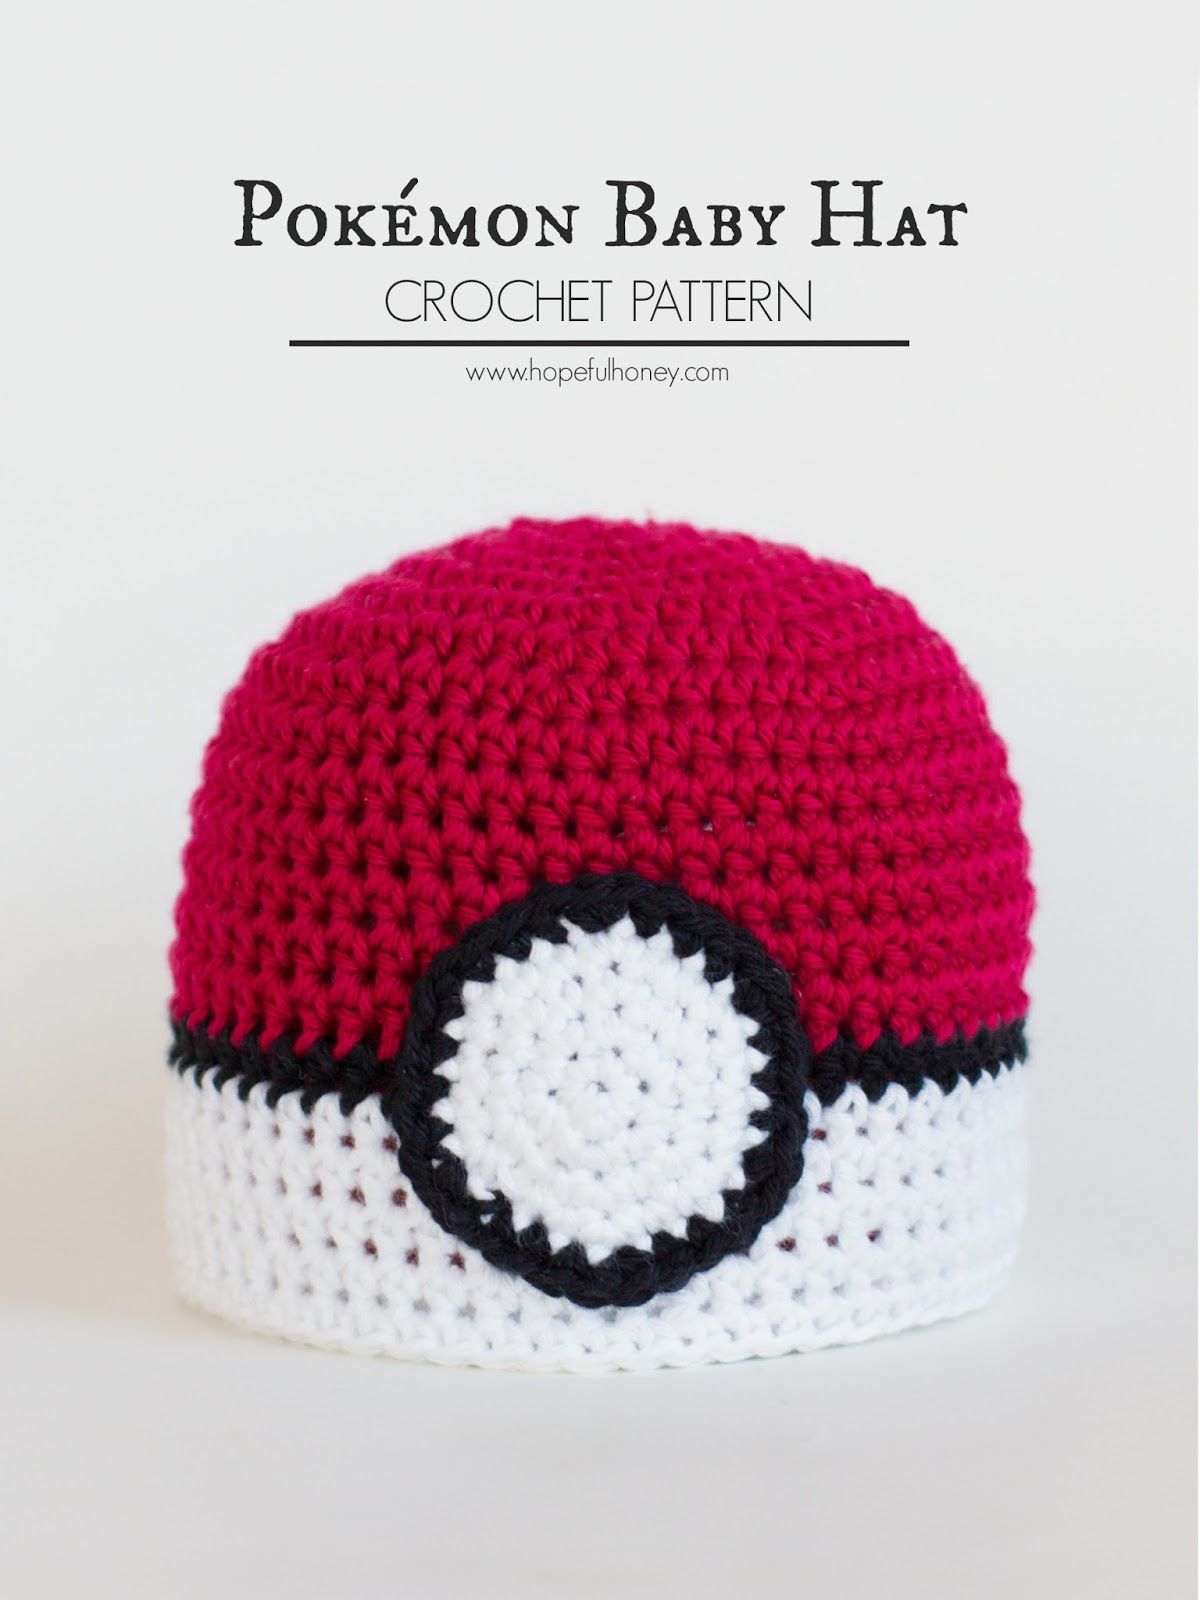 Pokémon Pokéball Inspired Baby Hat - Free Crochet Pattern | Bilder